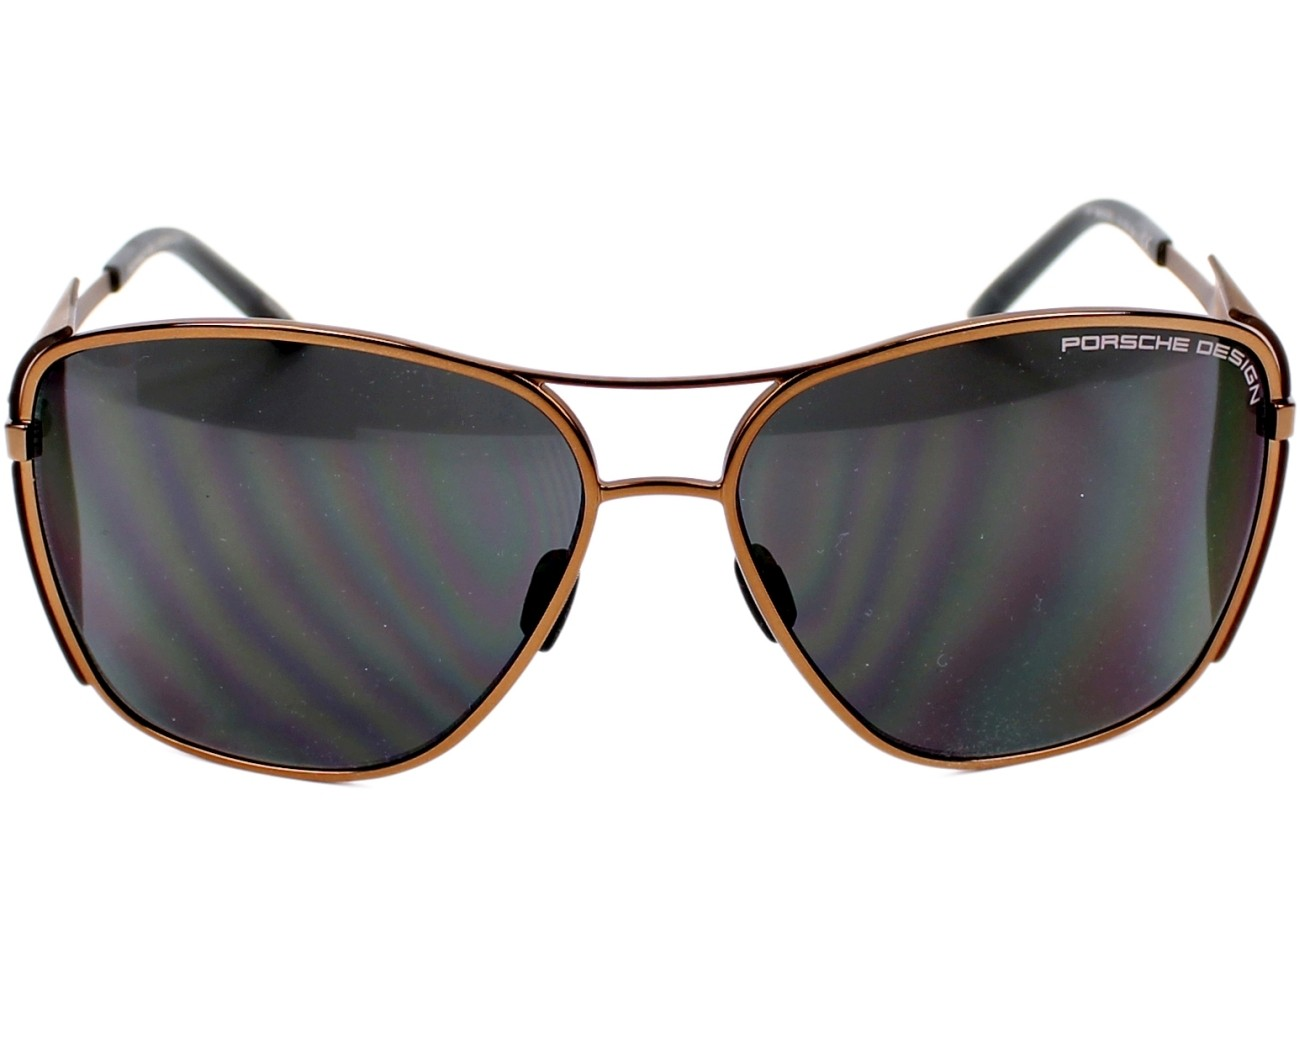 porsche design sunglasses p 8600 d buy now and save 55 visionet. Black Bedroom Furniture Sets. Home Design Ideas